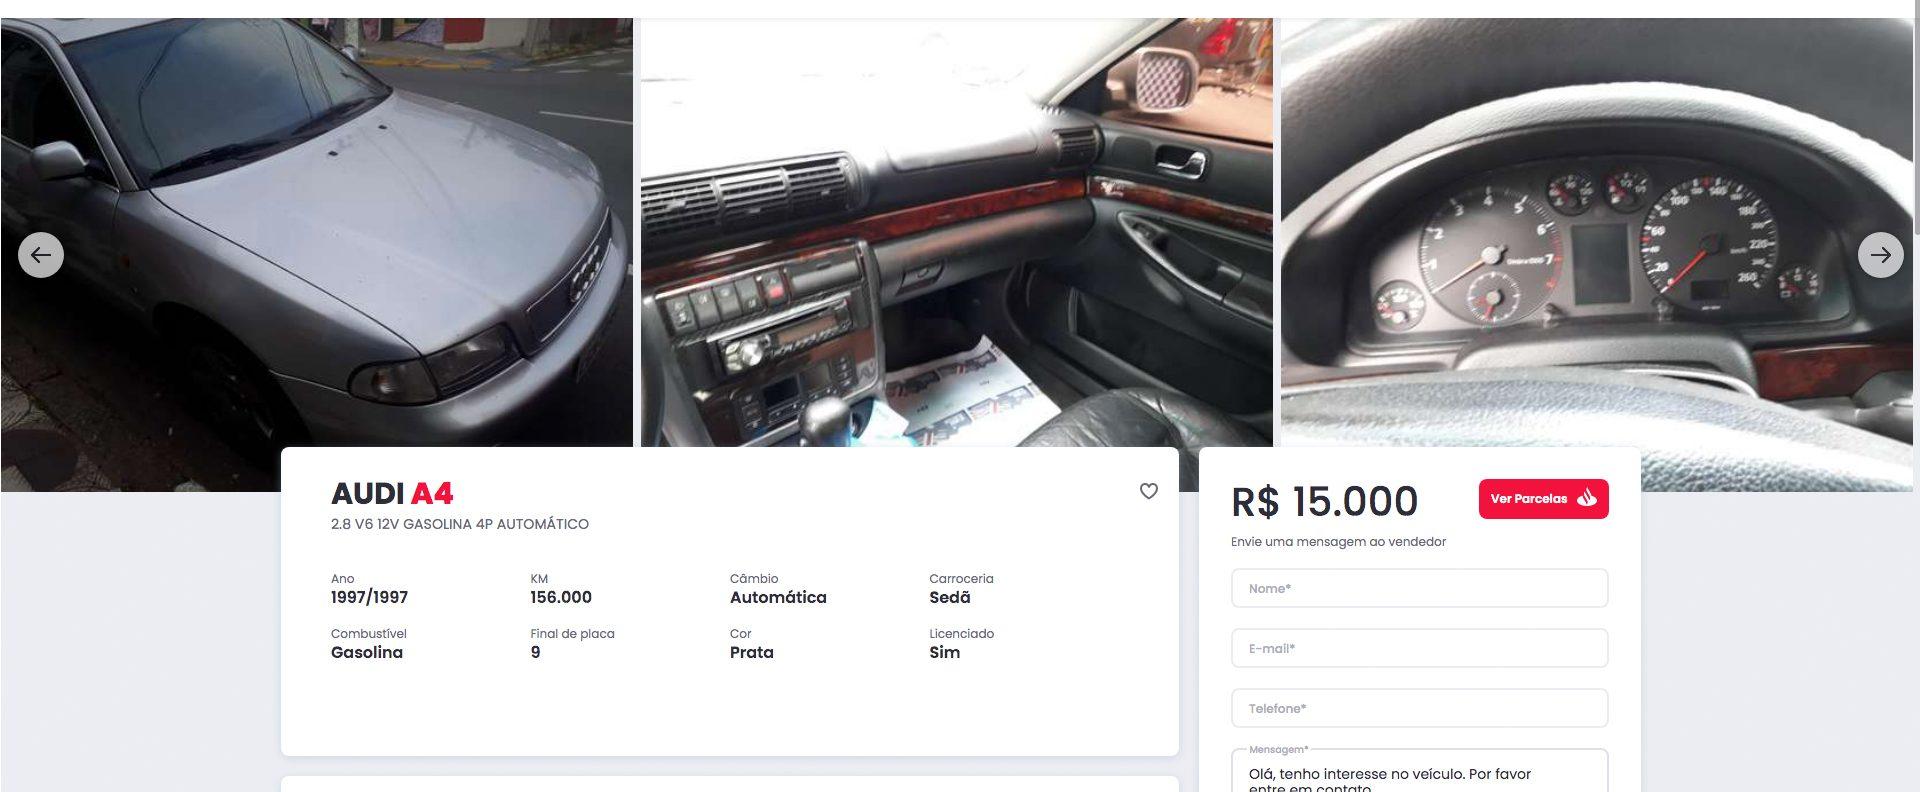 Audi A 4 97